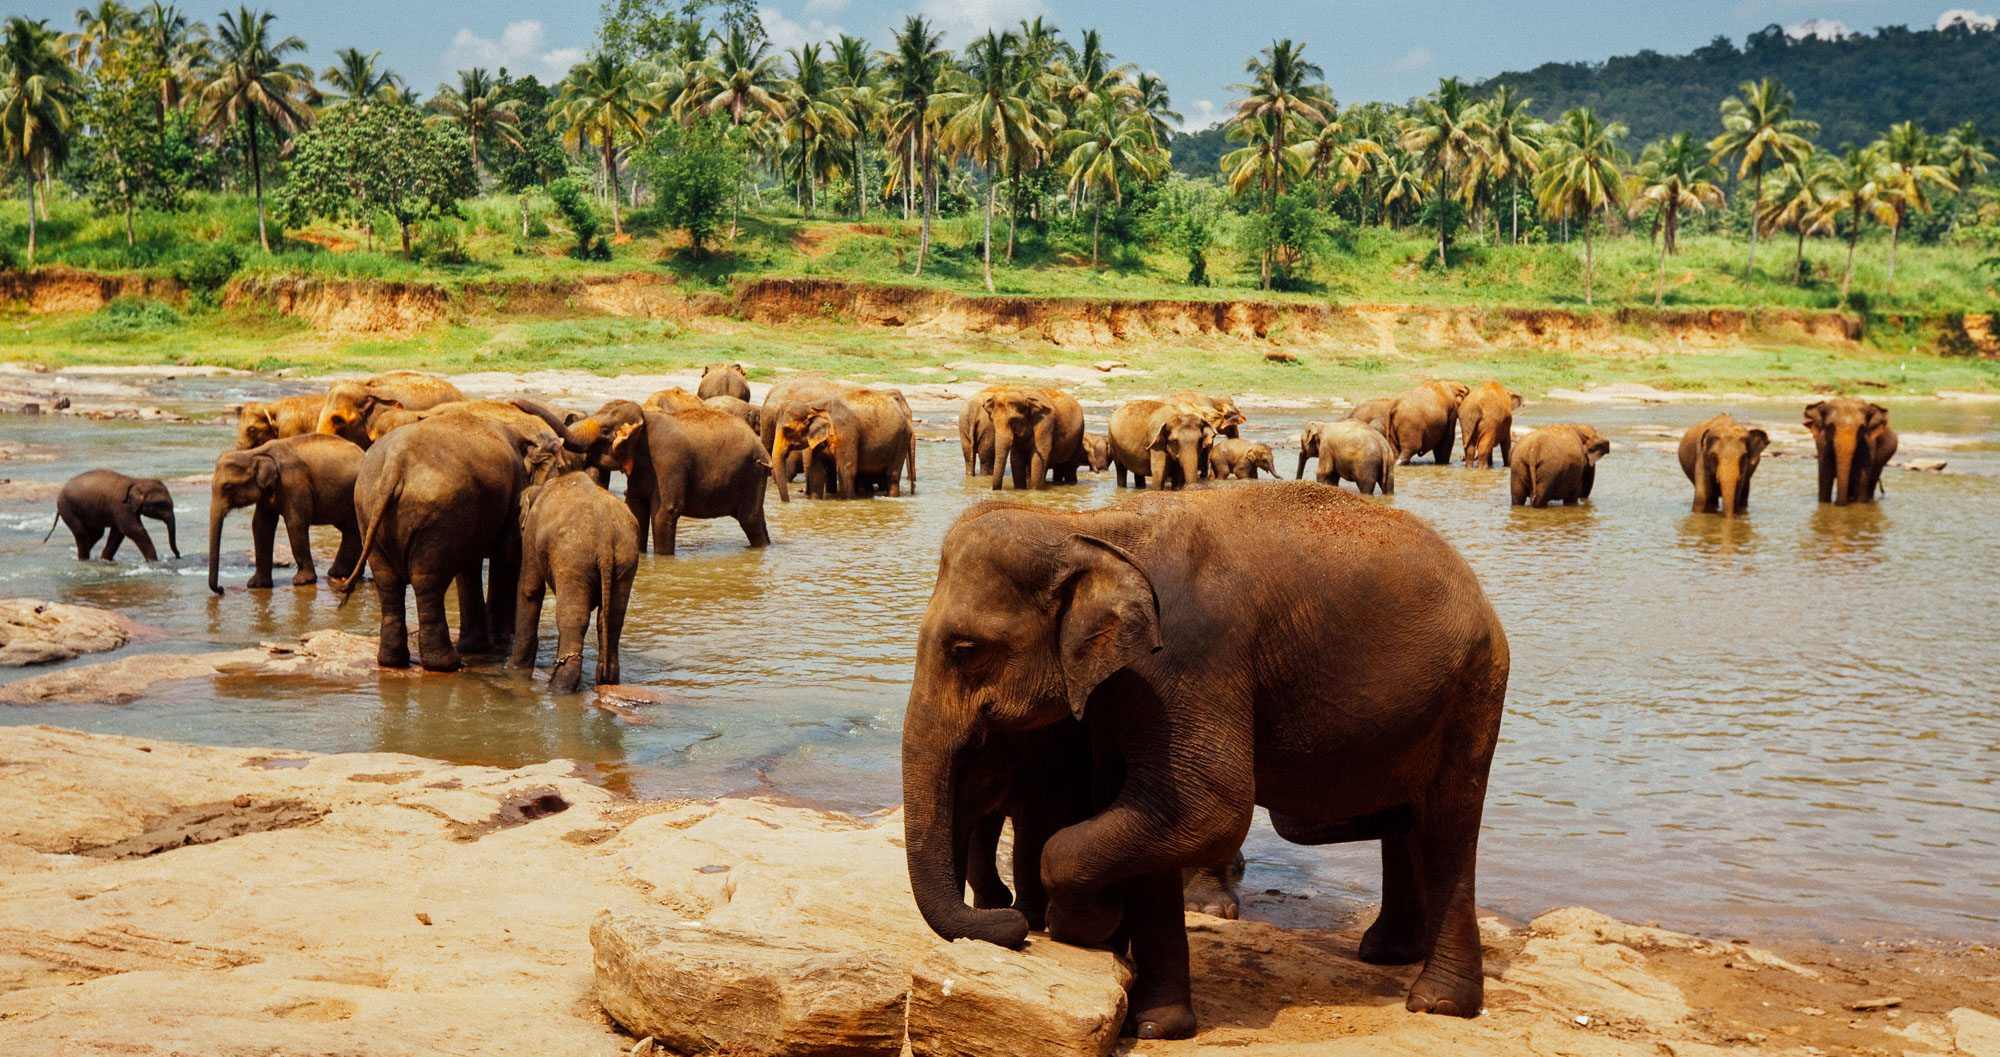 Elephants cooling down in a stream, Sri Lanka